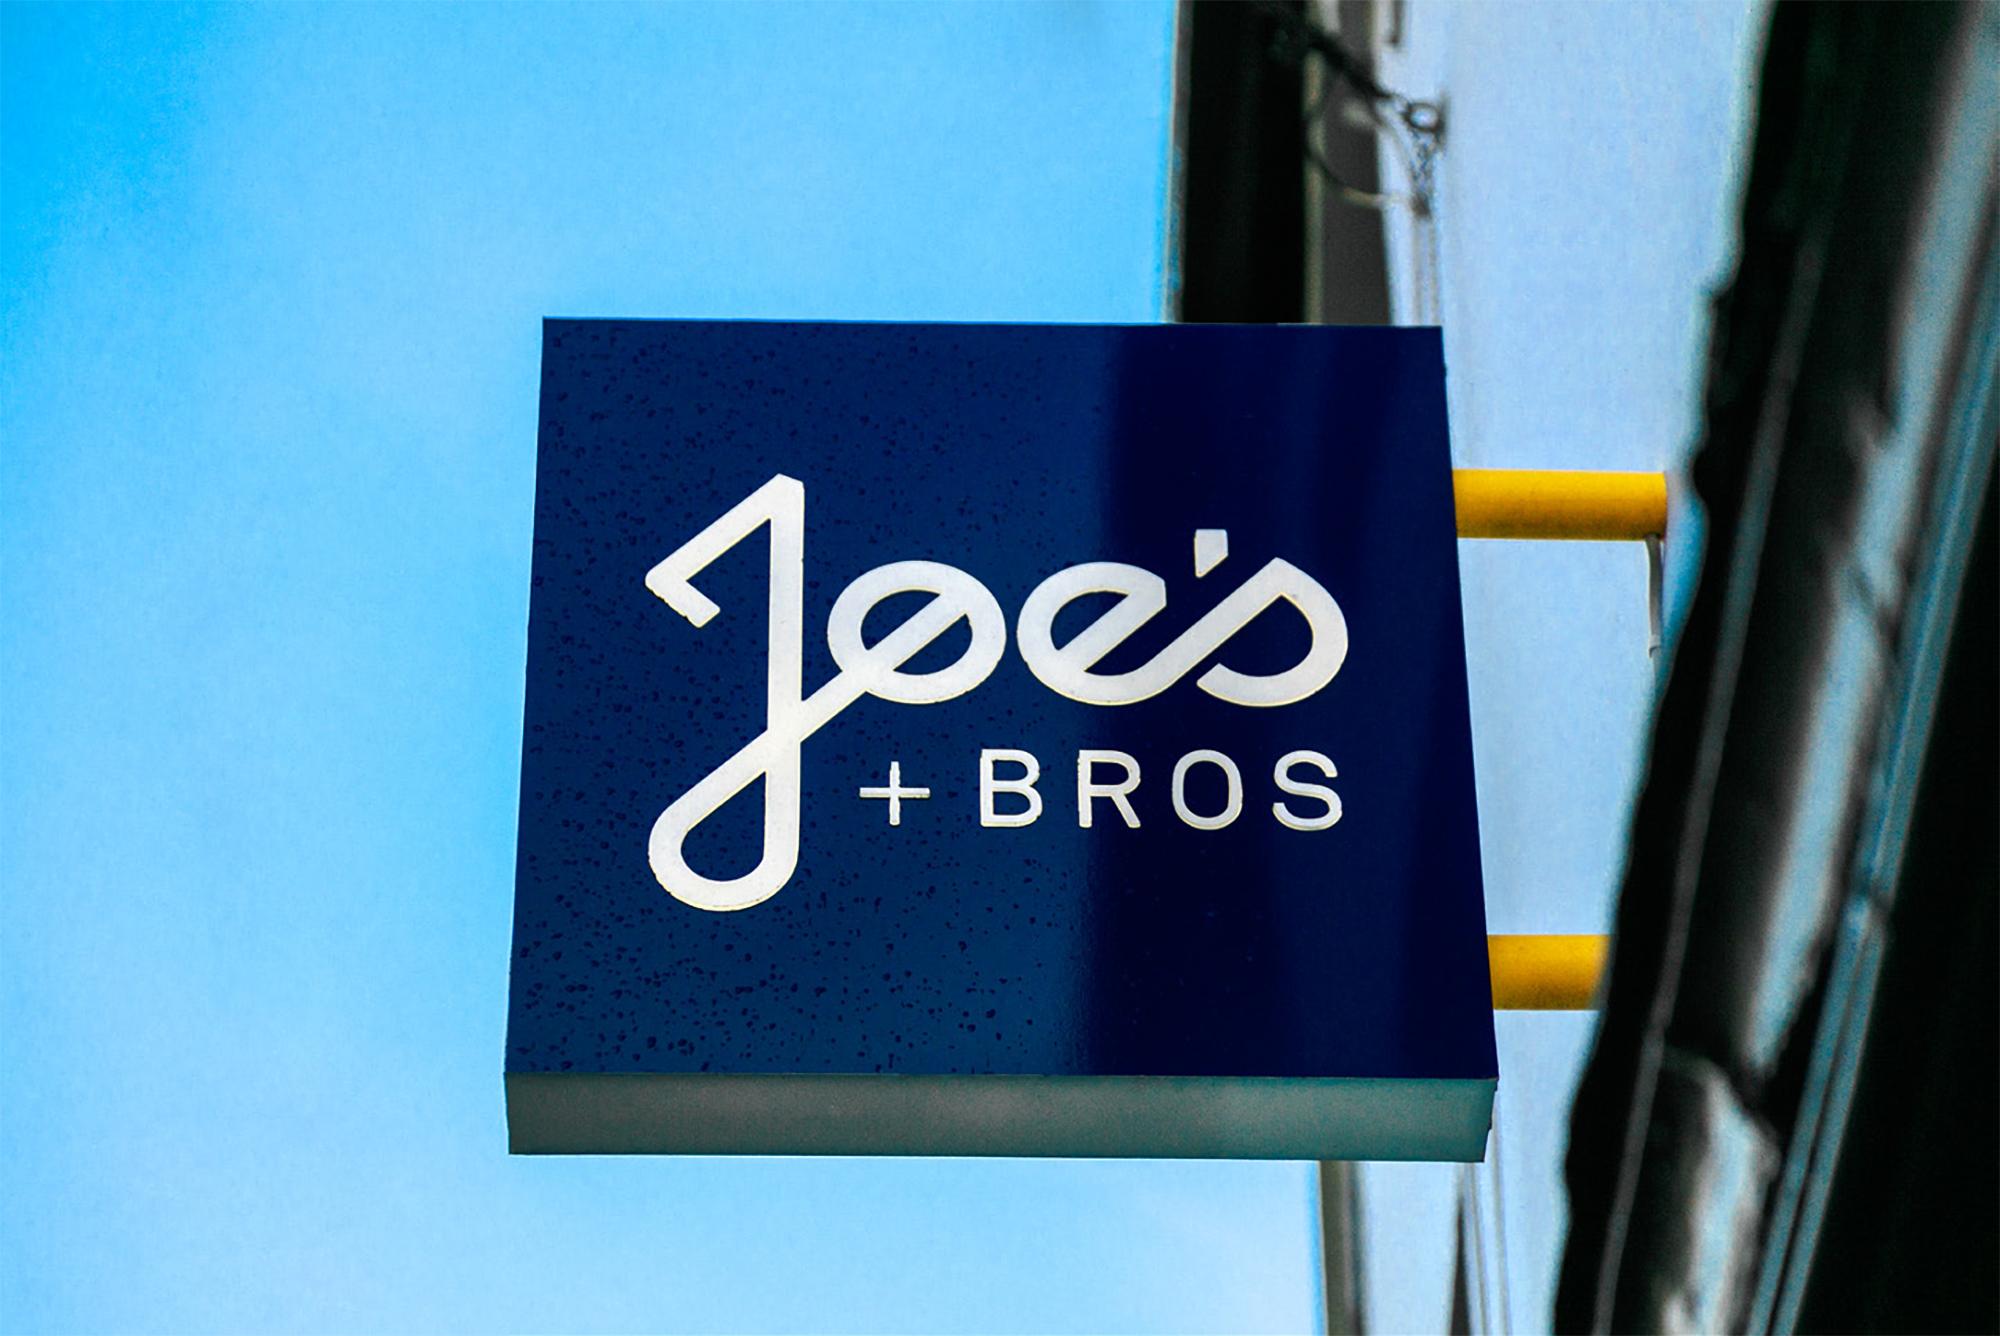 Cover image: Joe's + Bros